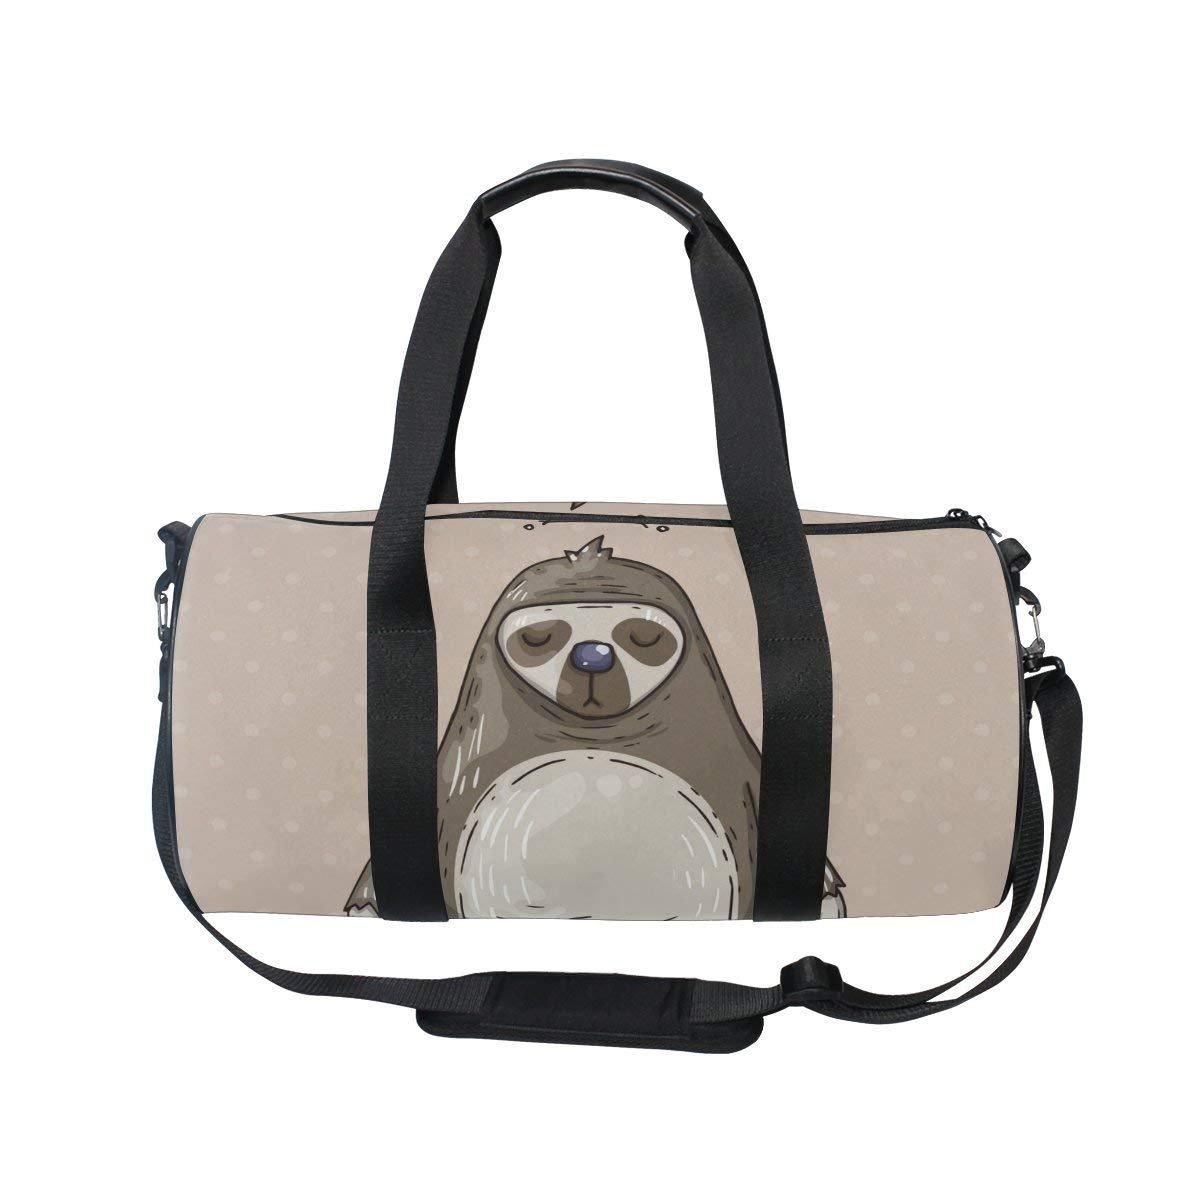 OuLian Women Gym Bag Funny Sloth Sitting Mens Camp Duffel Bags Duffle Luggage Travel Bag